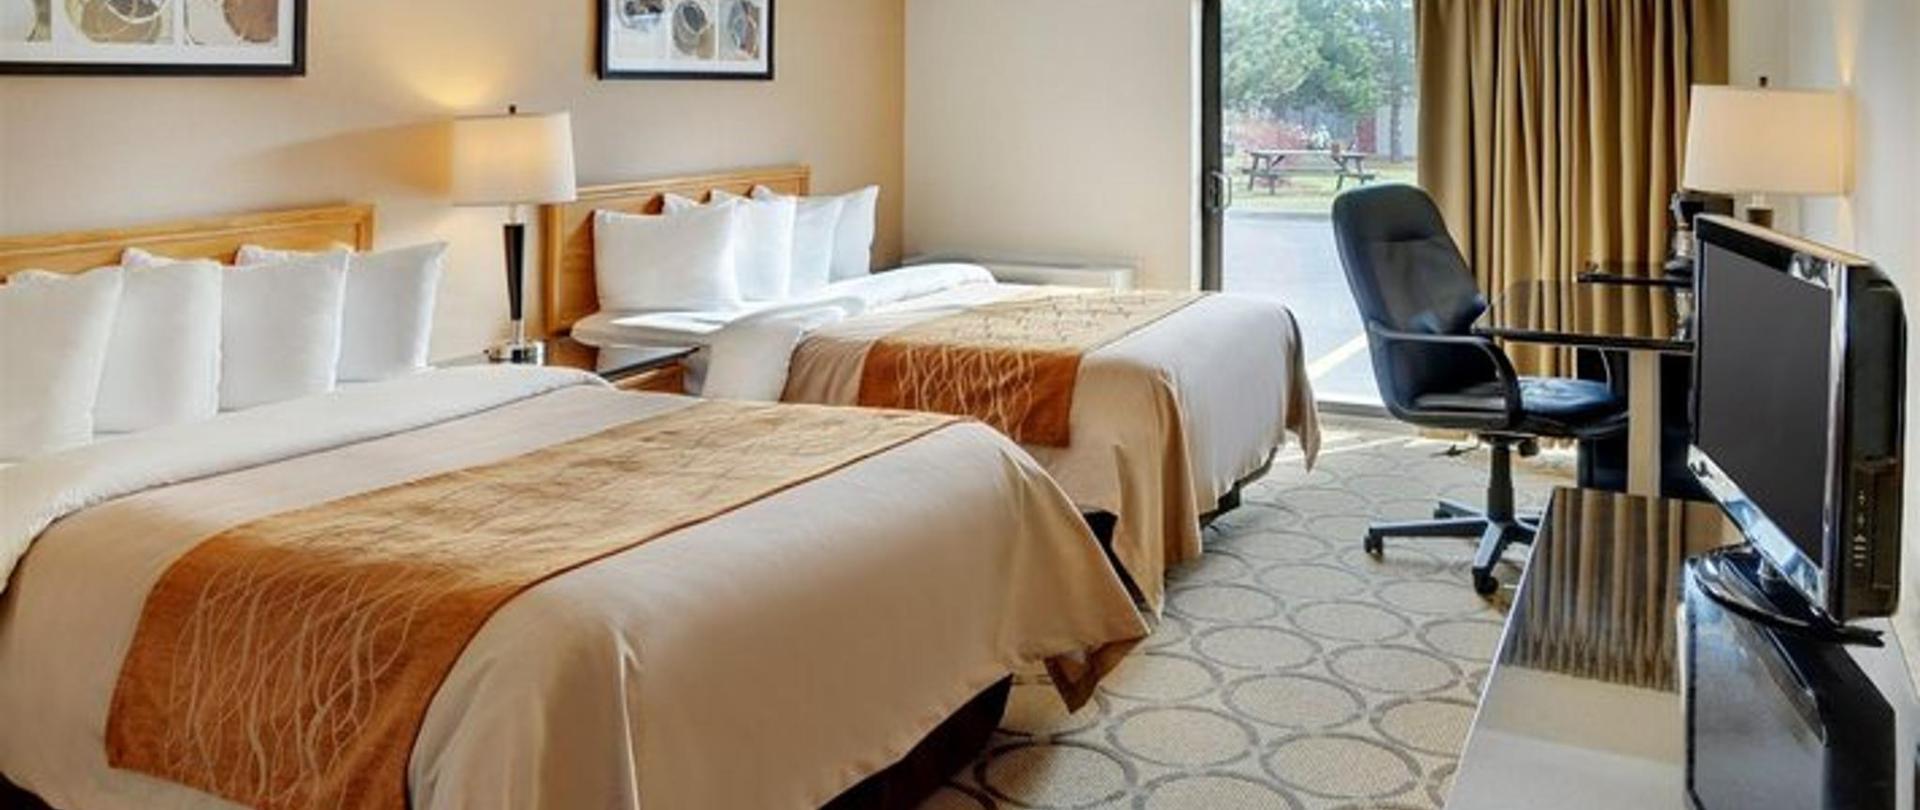 guestroom-with-two-pillowtop-beds-drive-up-patio-door-access1.jpg.711x355_default.jpg